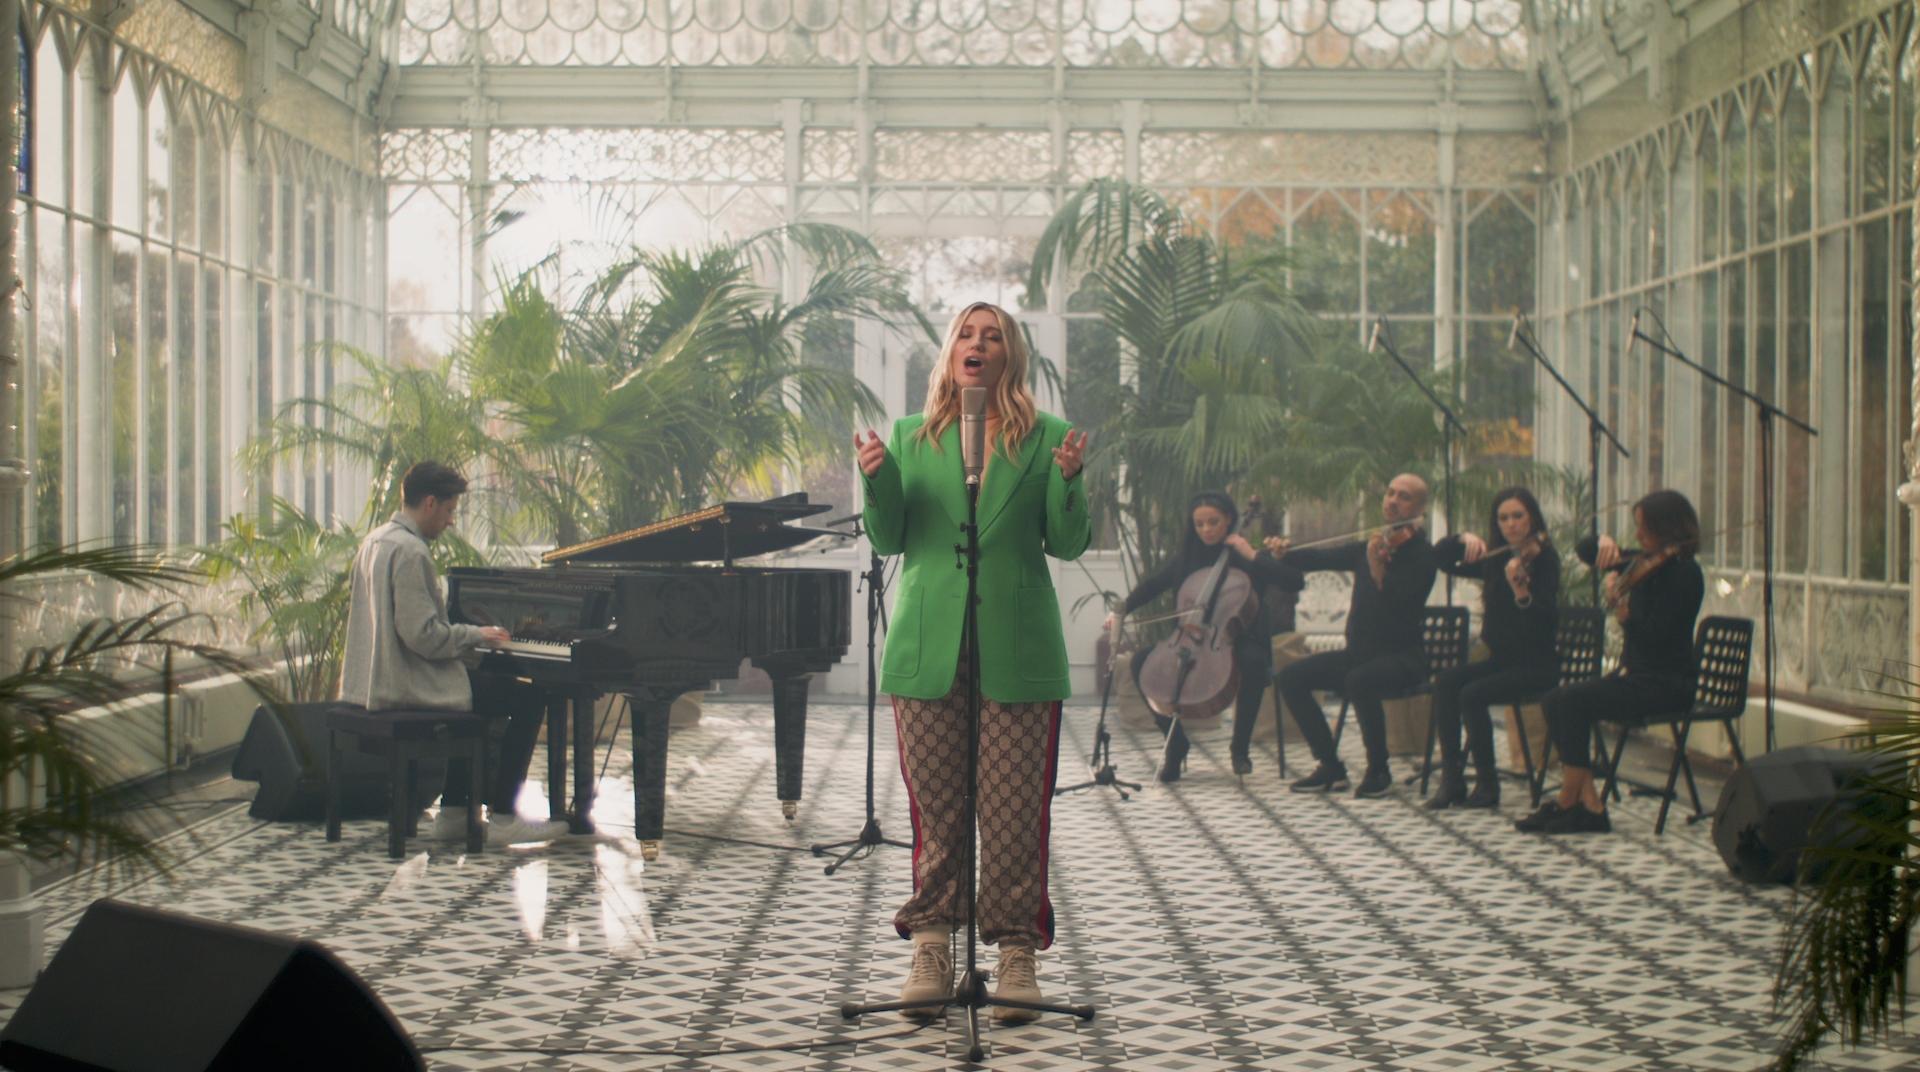 We Got Love (Acoustic) - Sigala, Ella Henderson